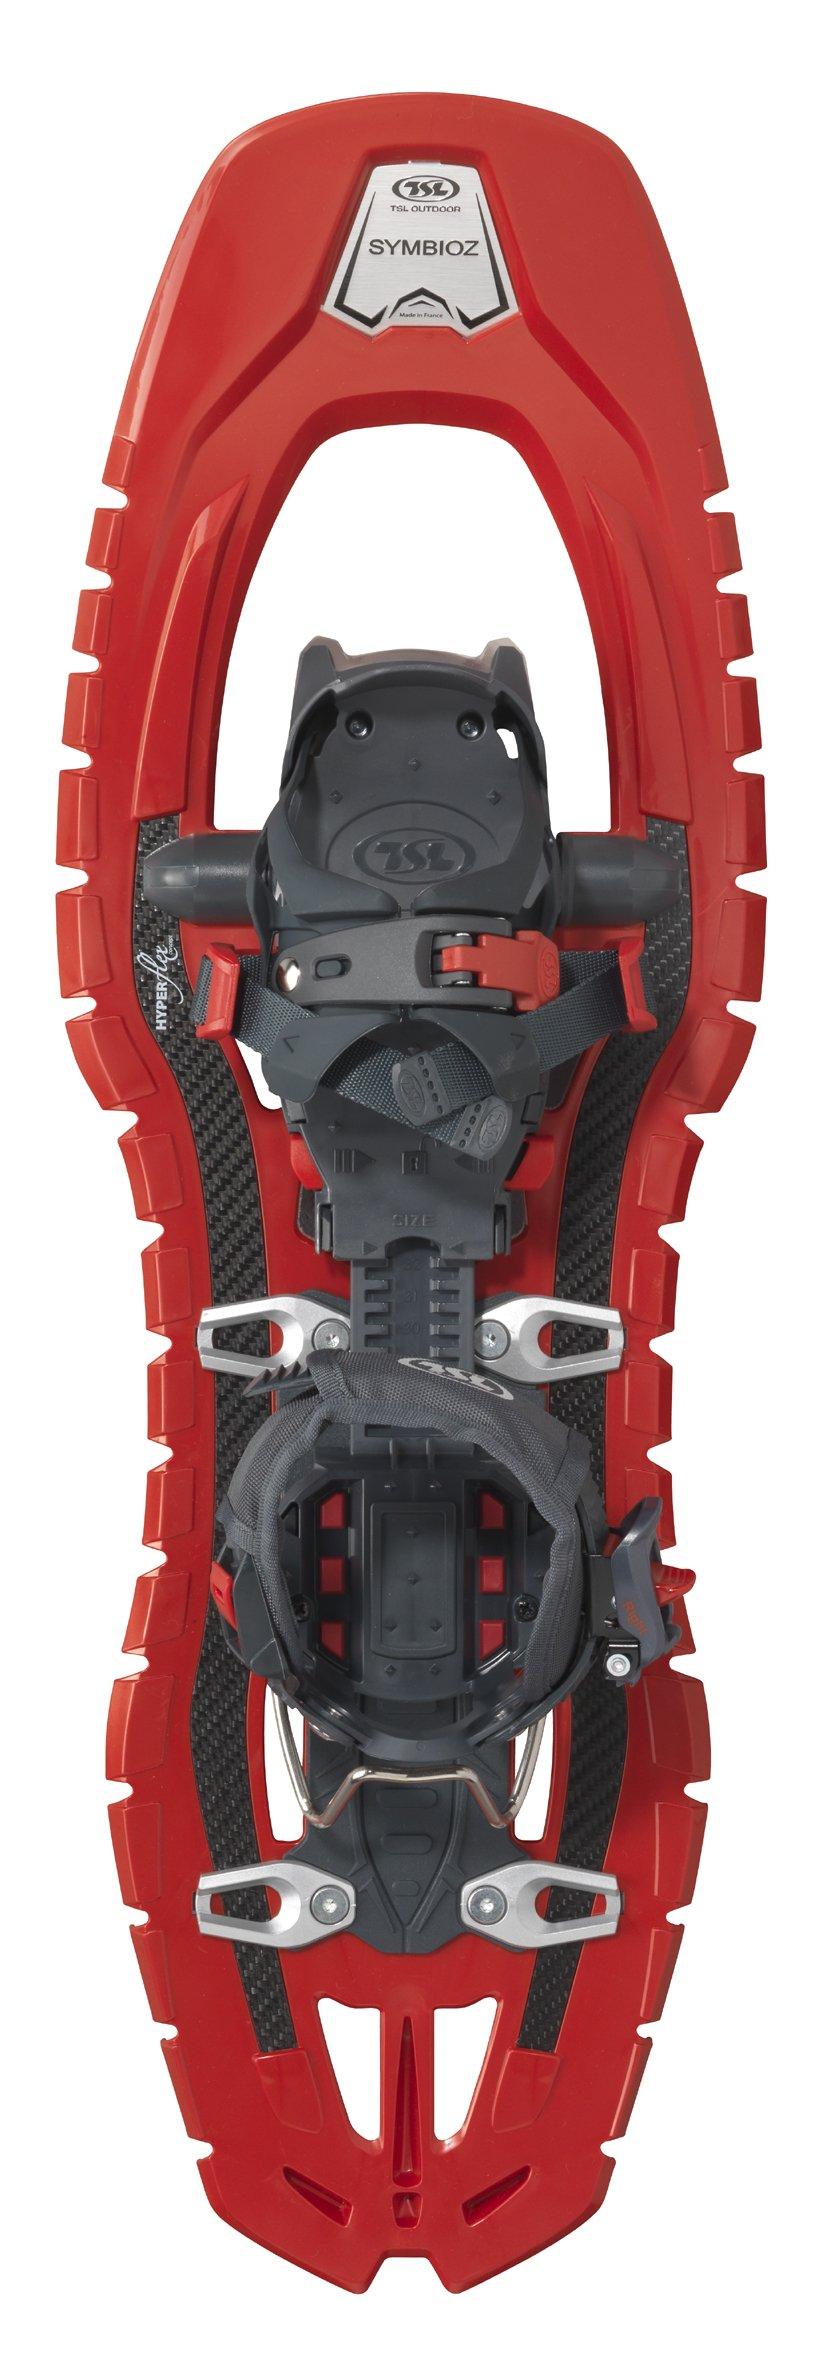 TSL Schneeschuhe Symbioz Elite, Ruby, L, PFRSL180